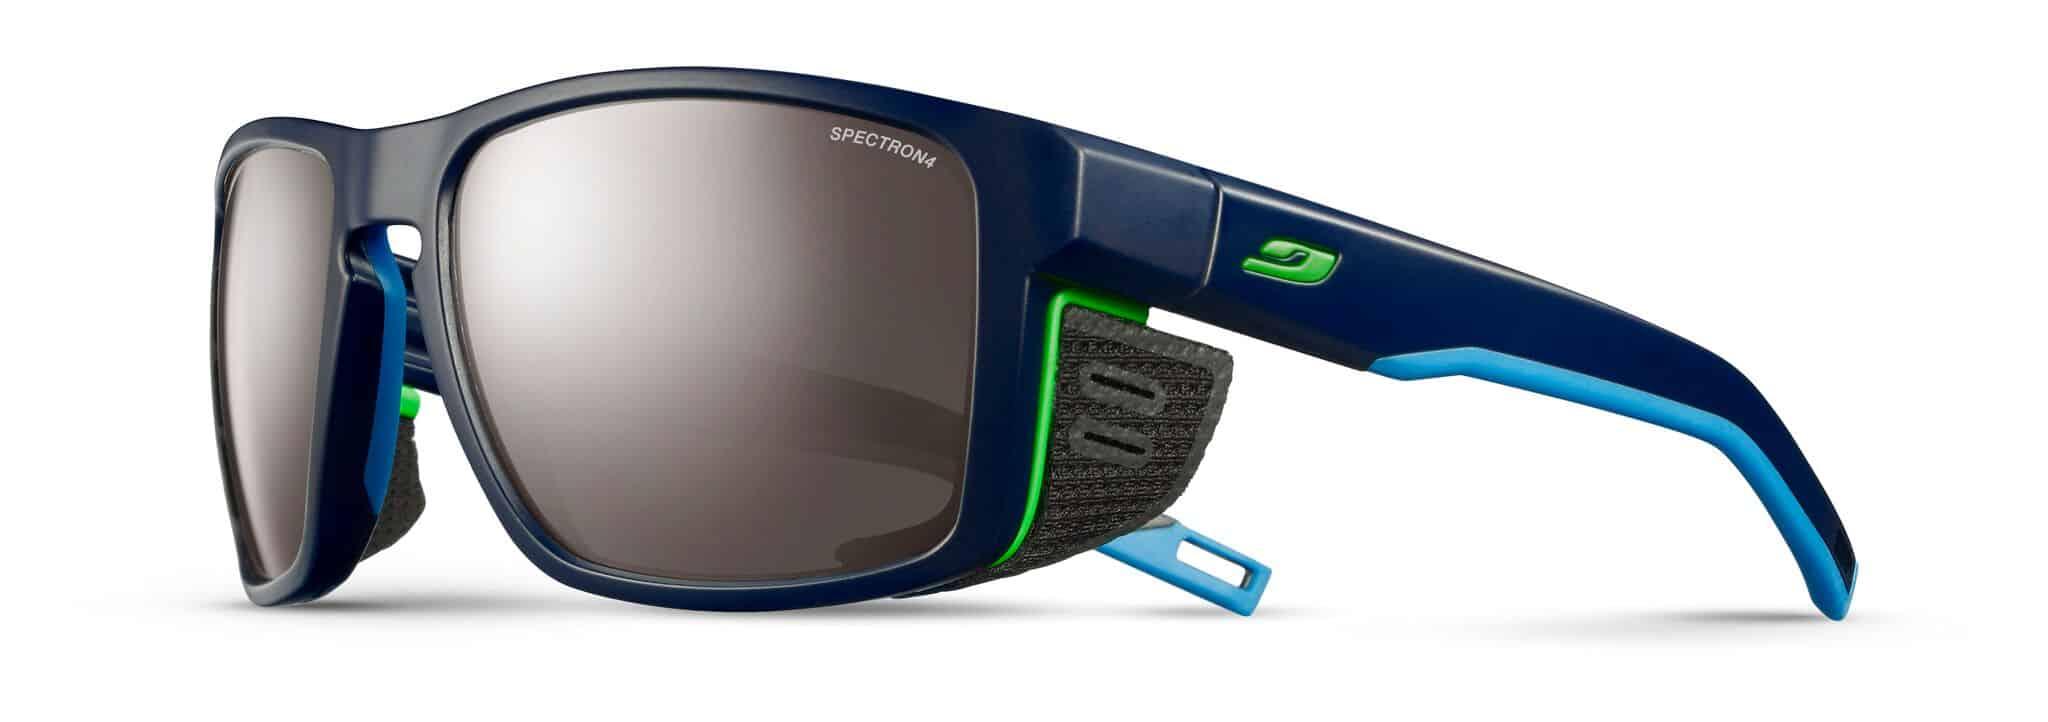 e8b2800d2649 Julbo Shield | Bifocal Sports Sunglasses, Fashion Sunglasses, High ...